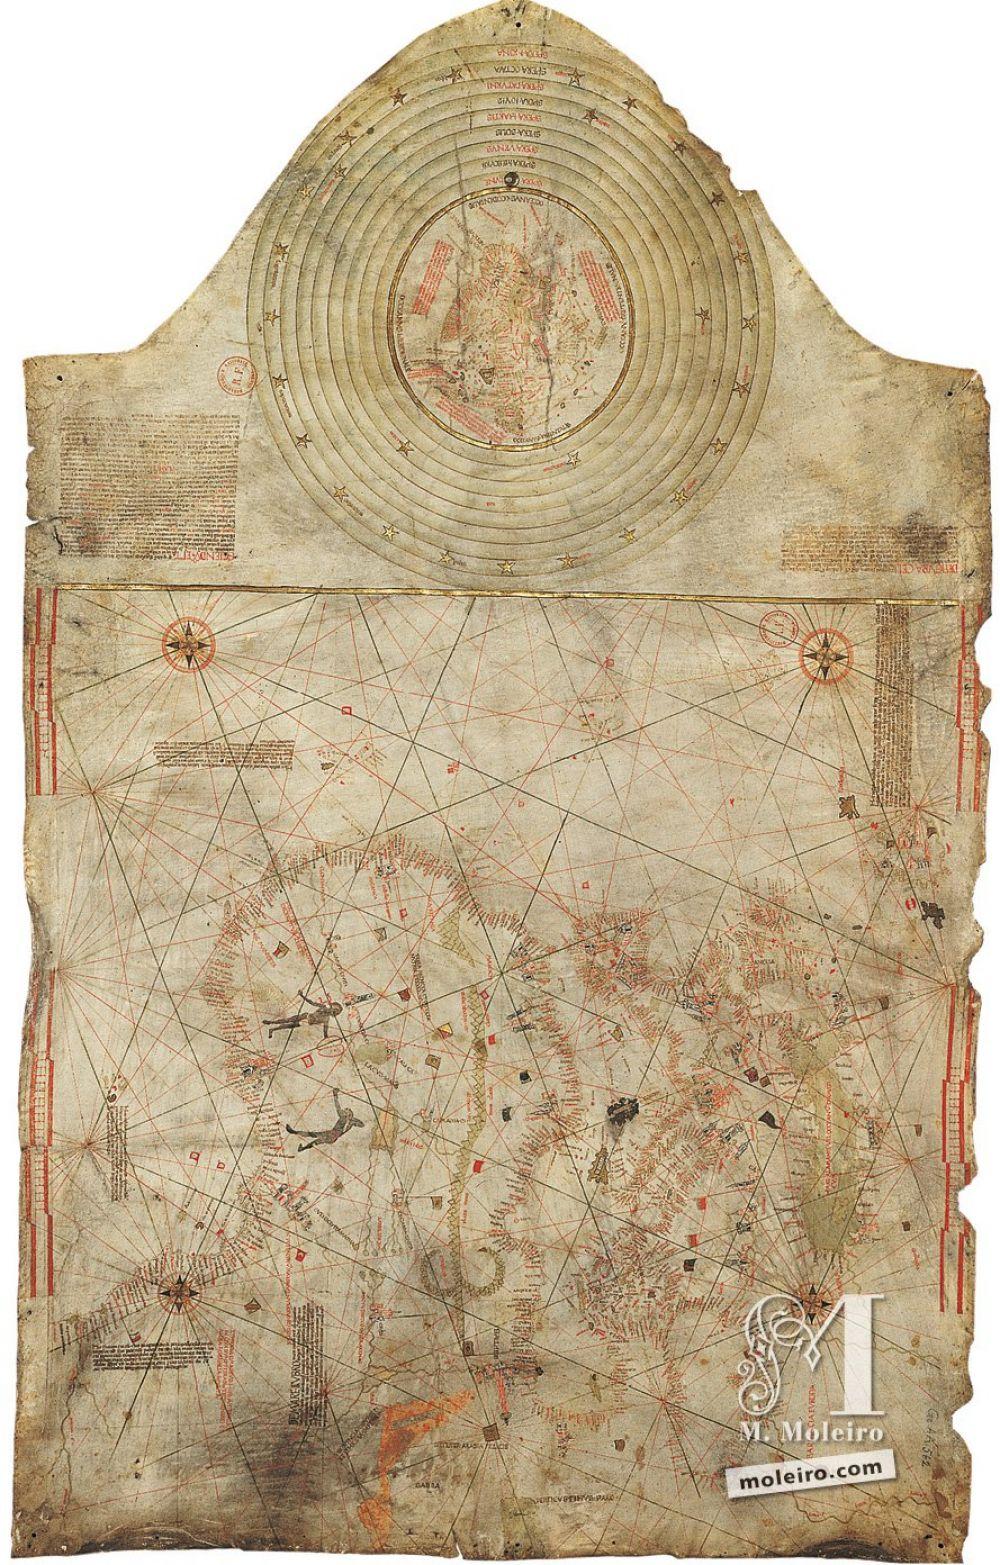 A Carta de Cristóvão Colombo, Mapa-múndi